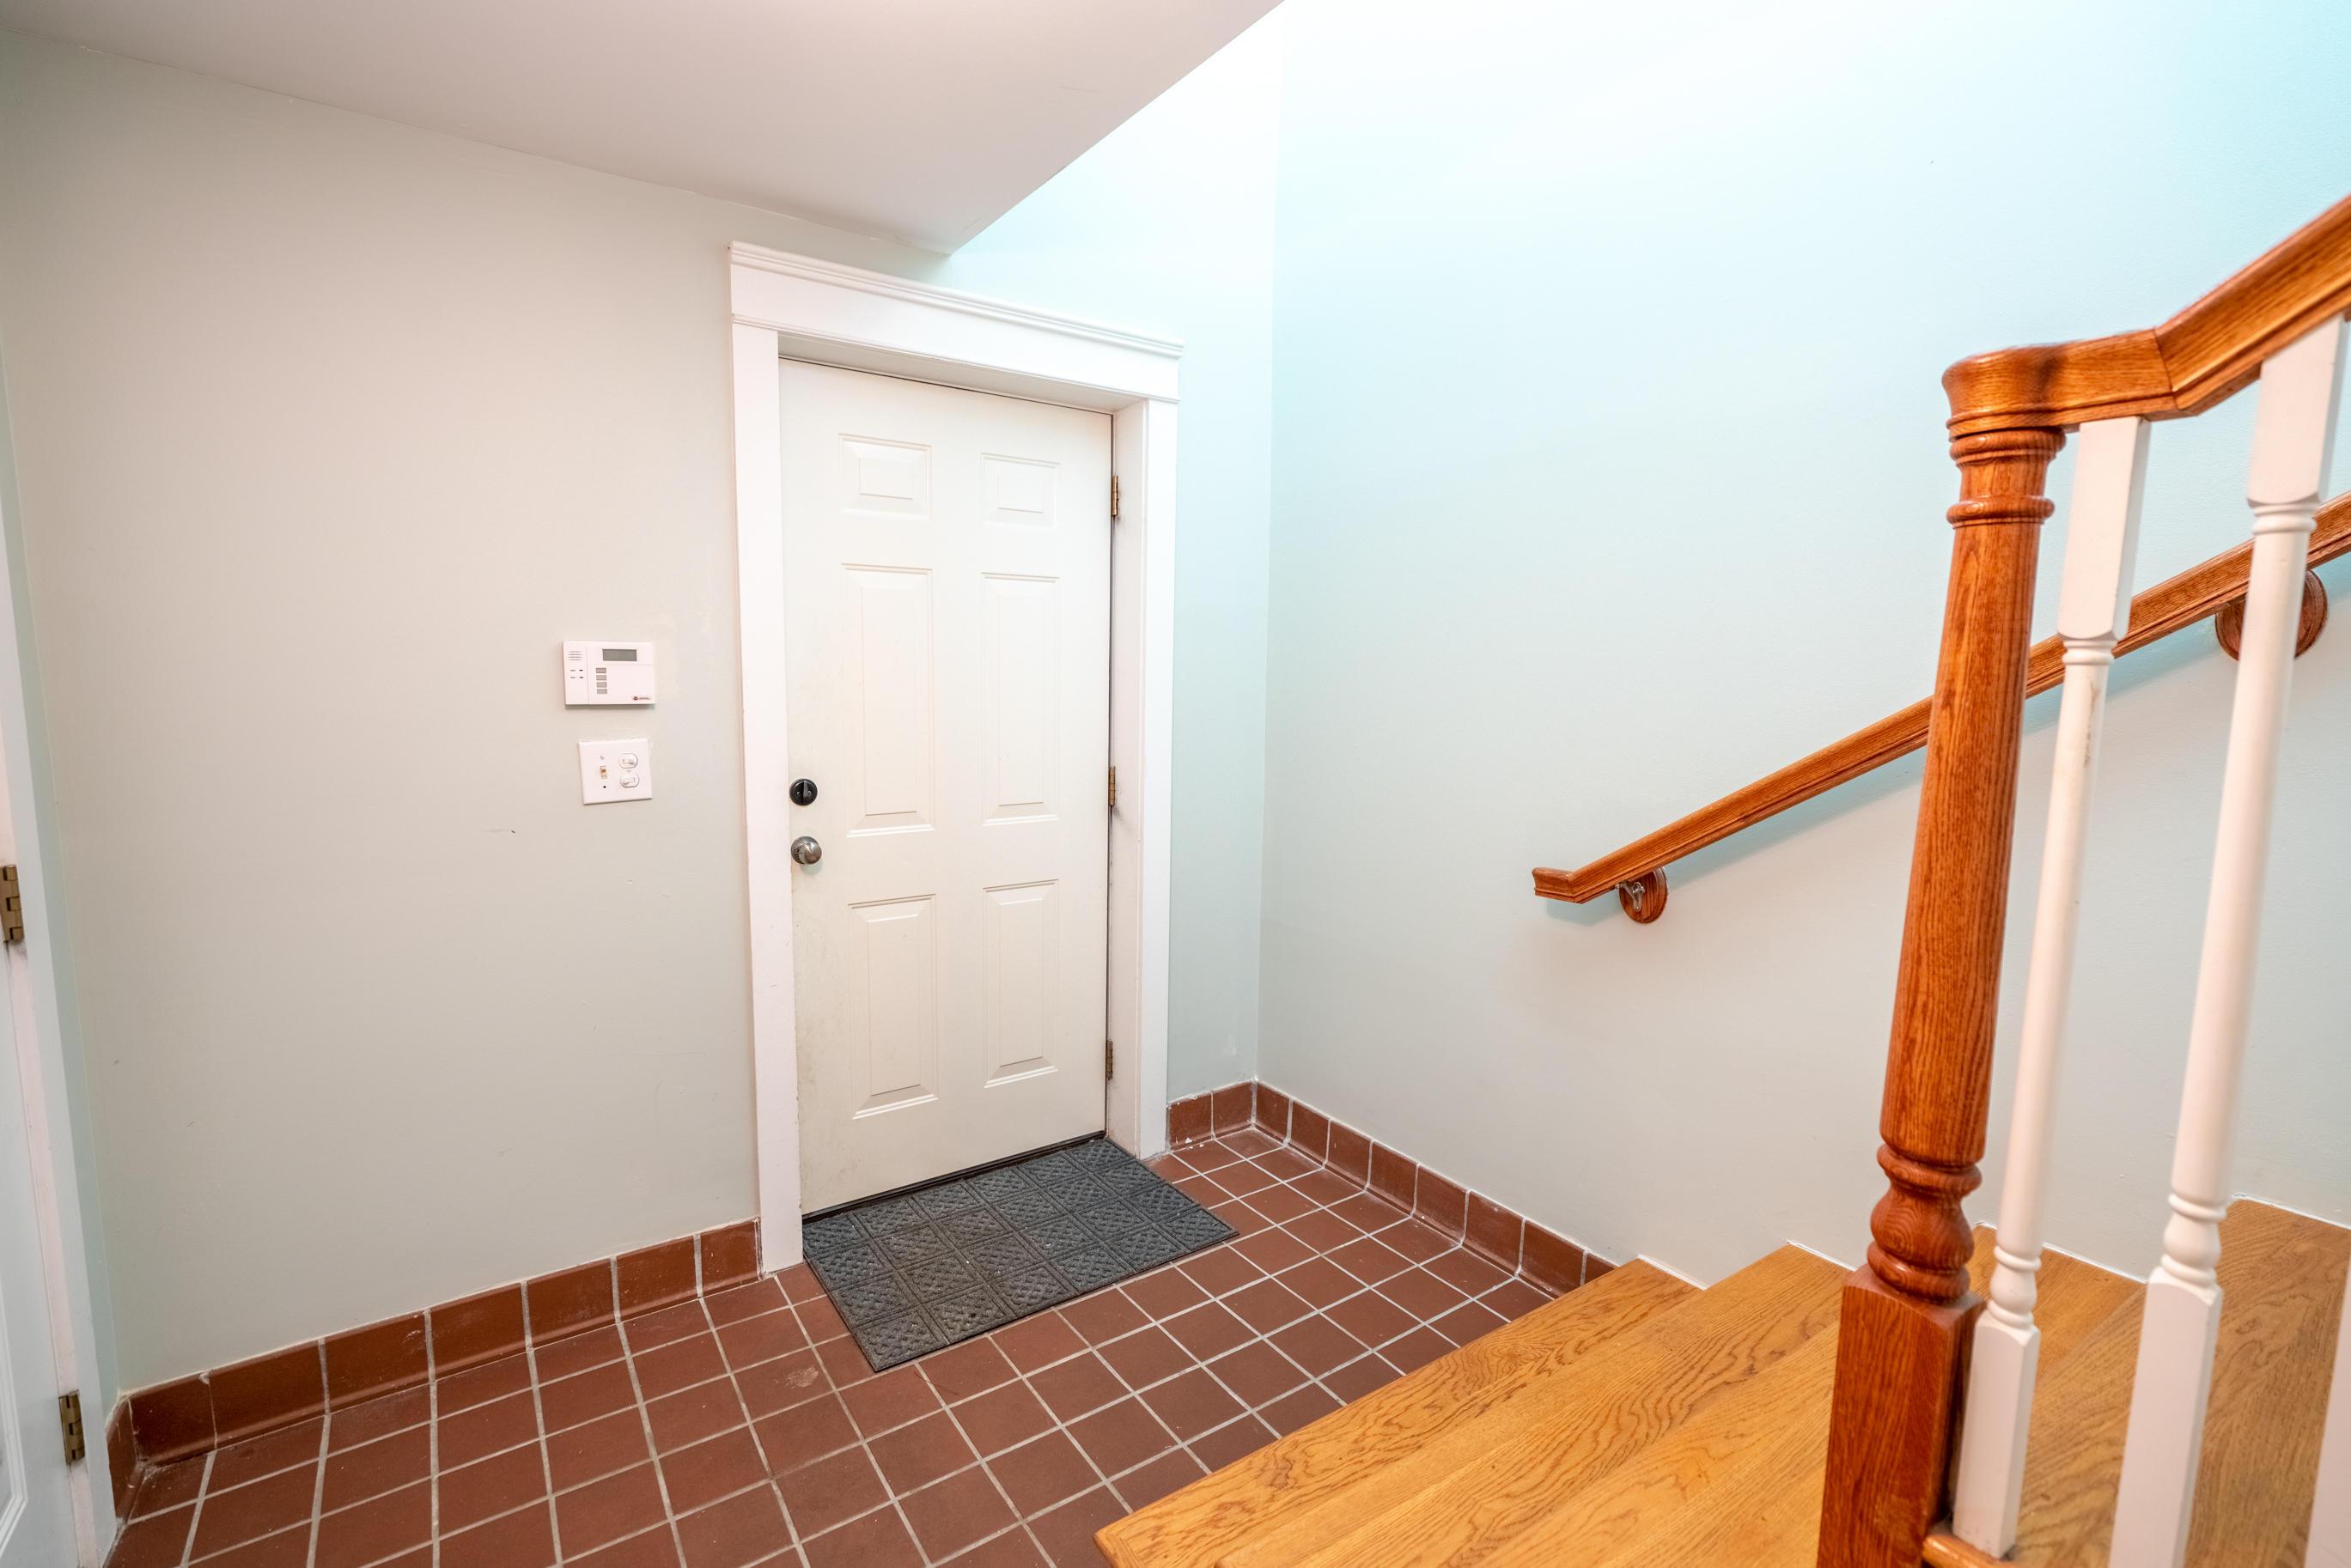 Etiwan Pointe Homes For Sale - 132 Winding Creek, Mount Pleasant, SC - 30